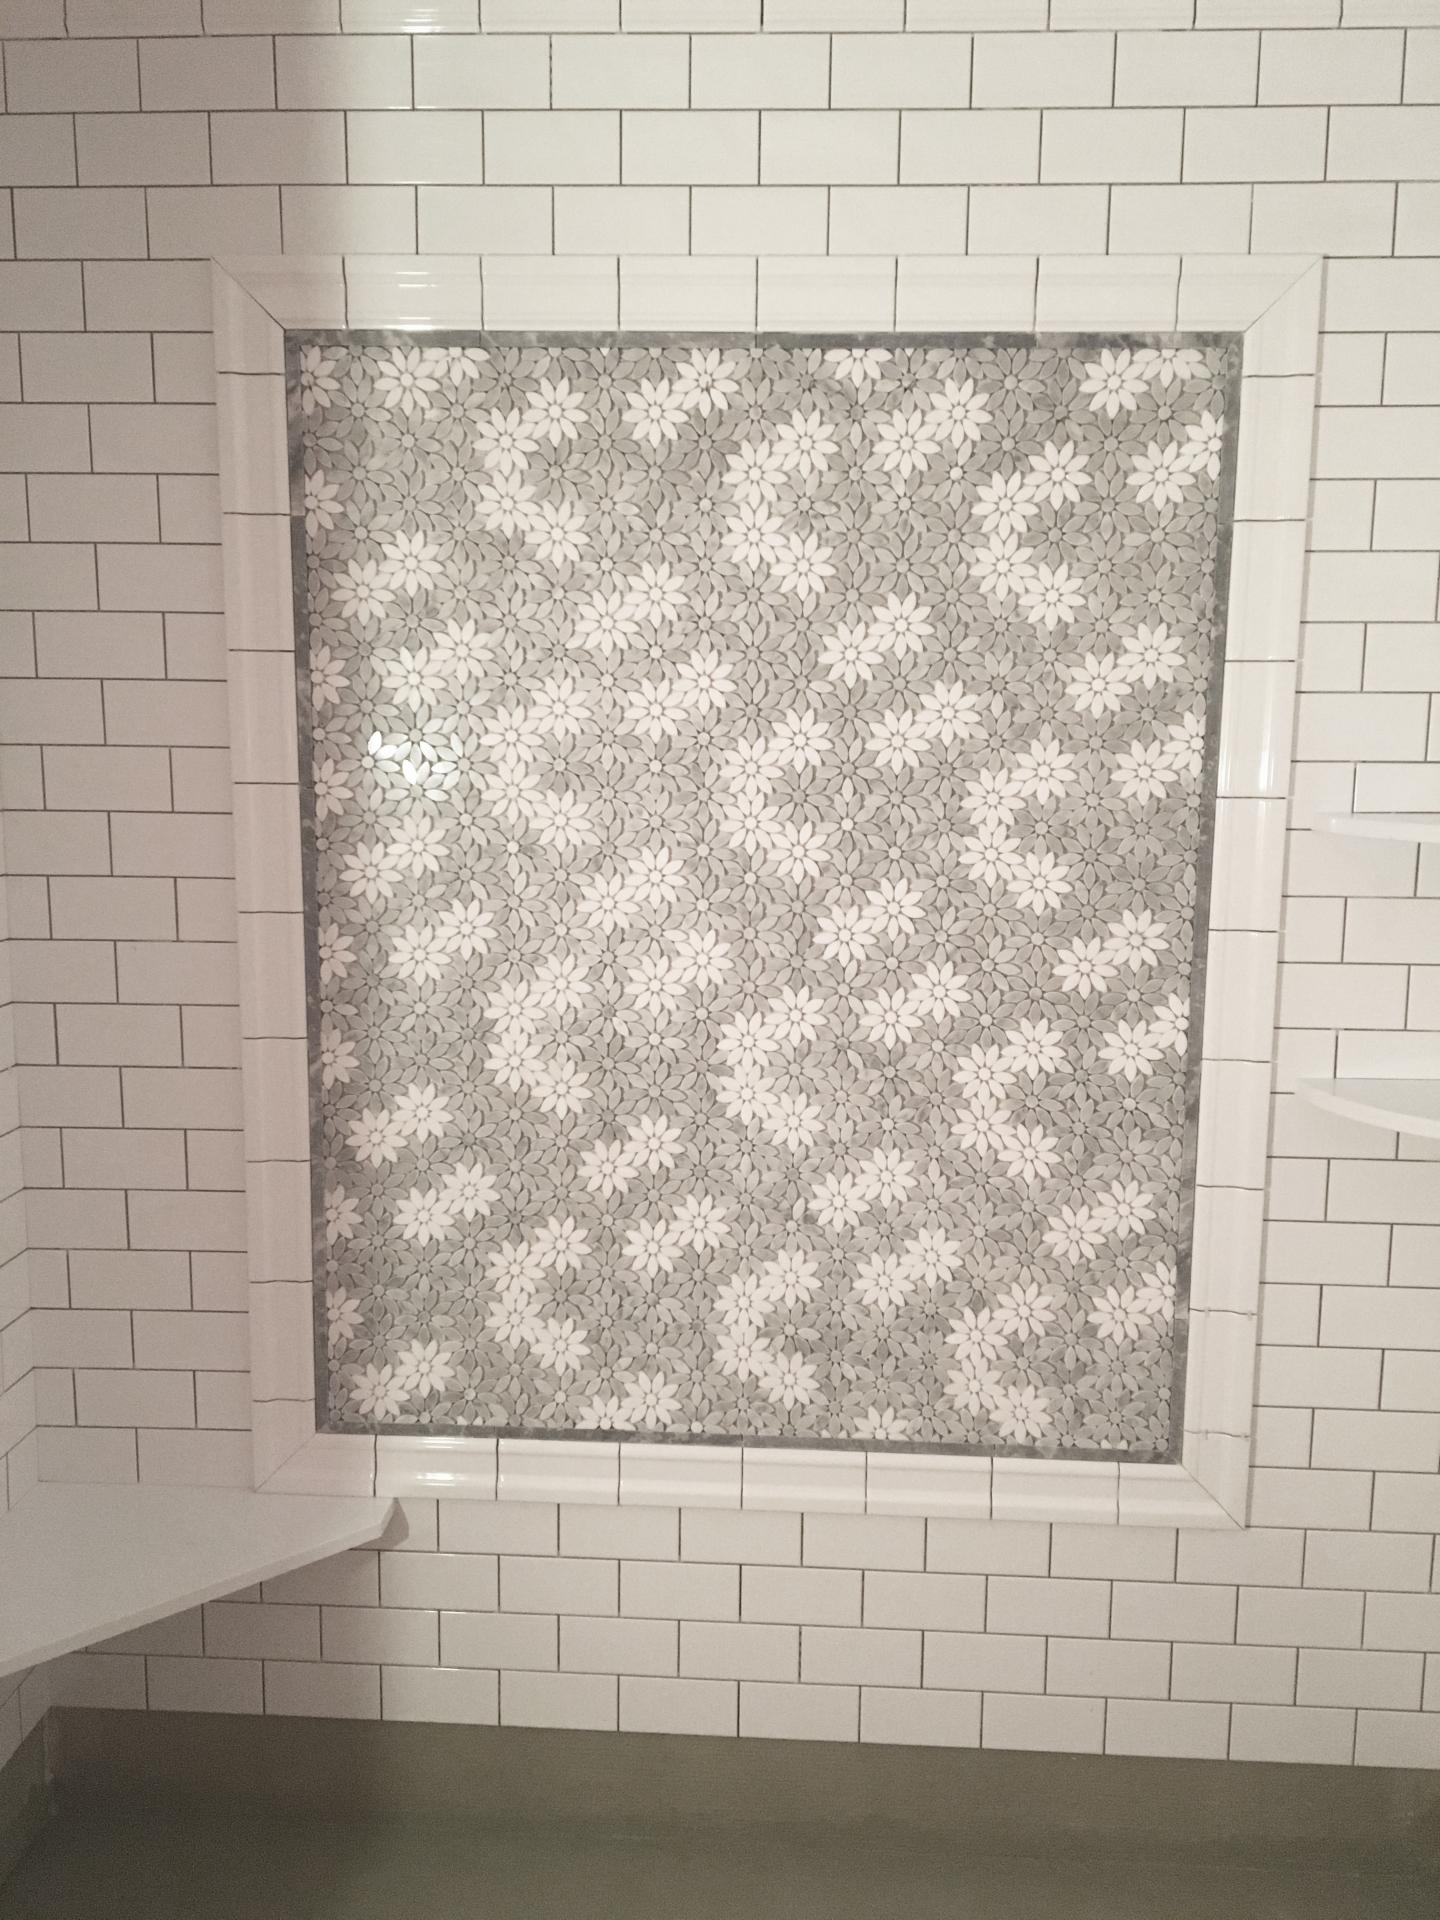 "Bloom- 3"" White Carrara Venatino & White Thassos Random Mosaic Polished"